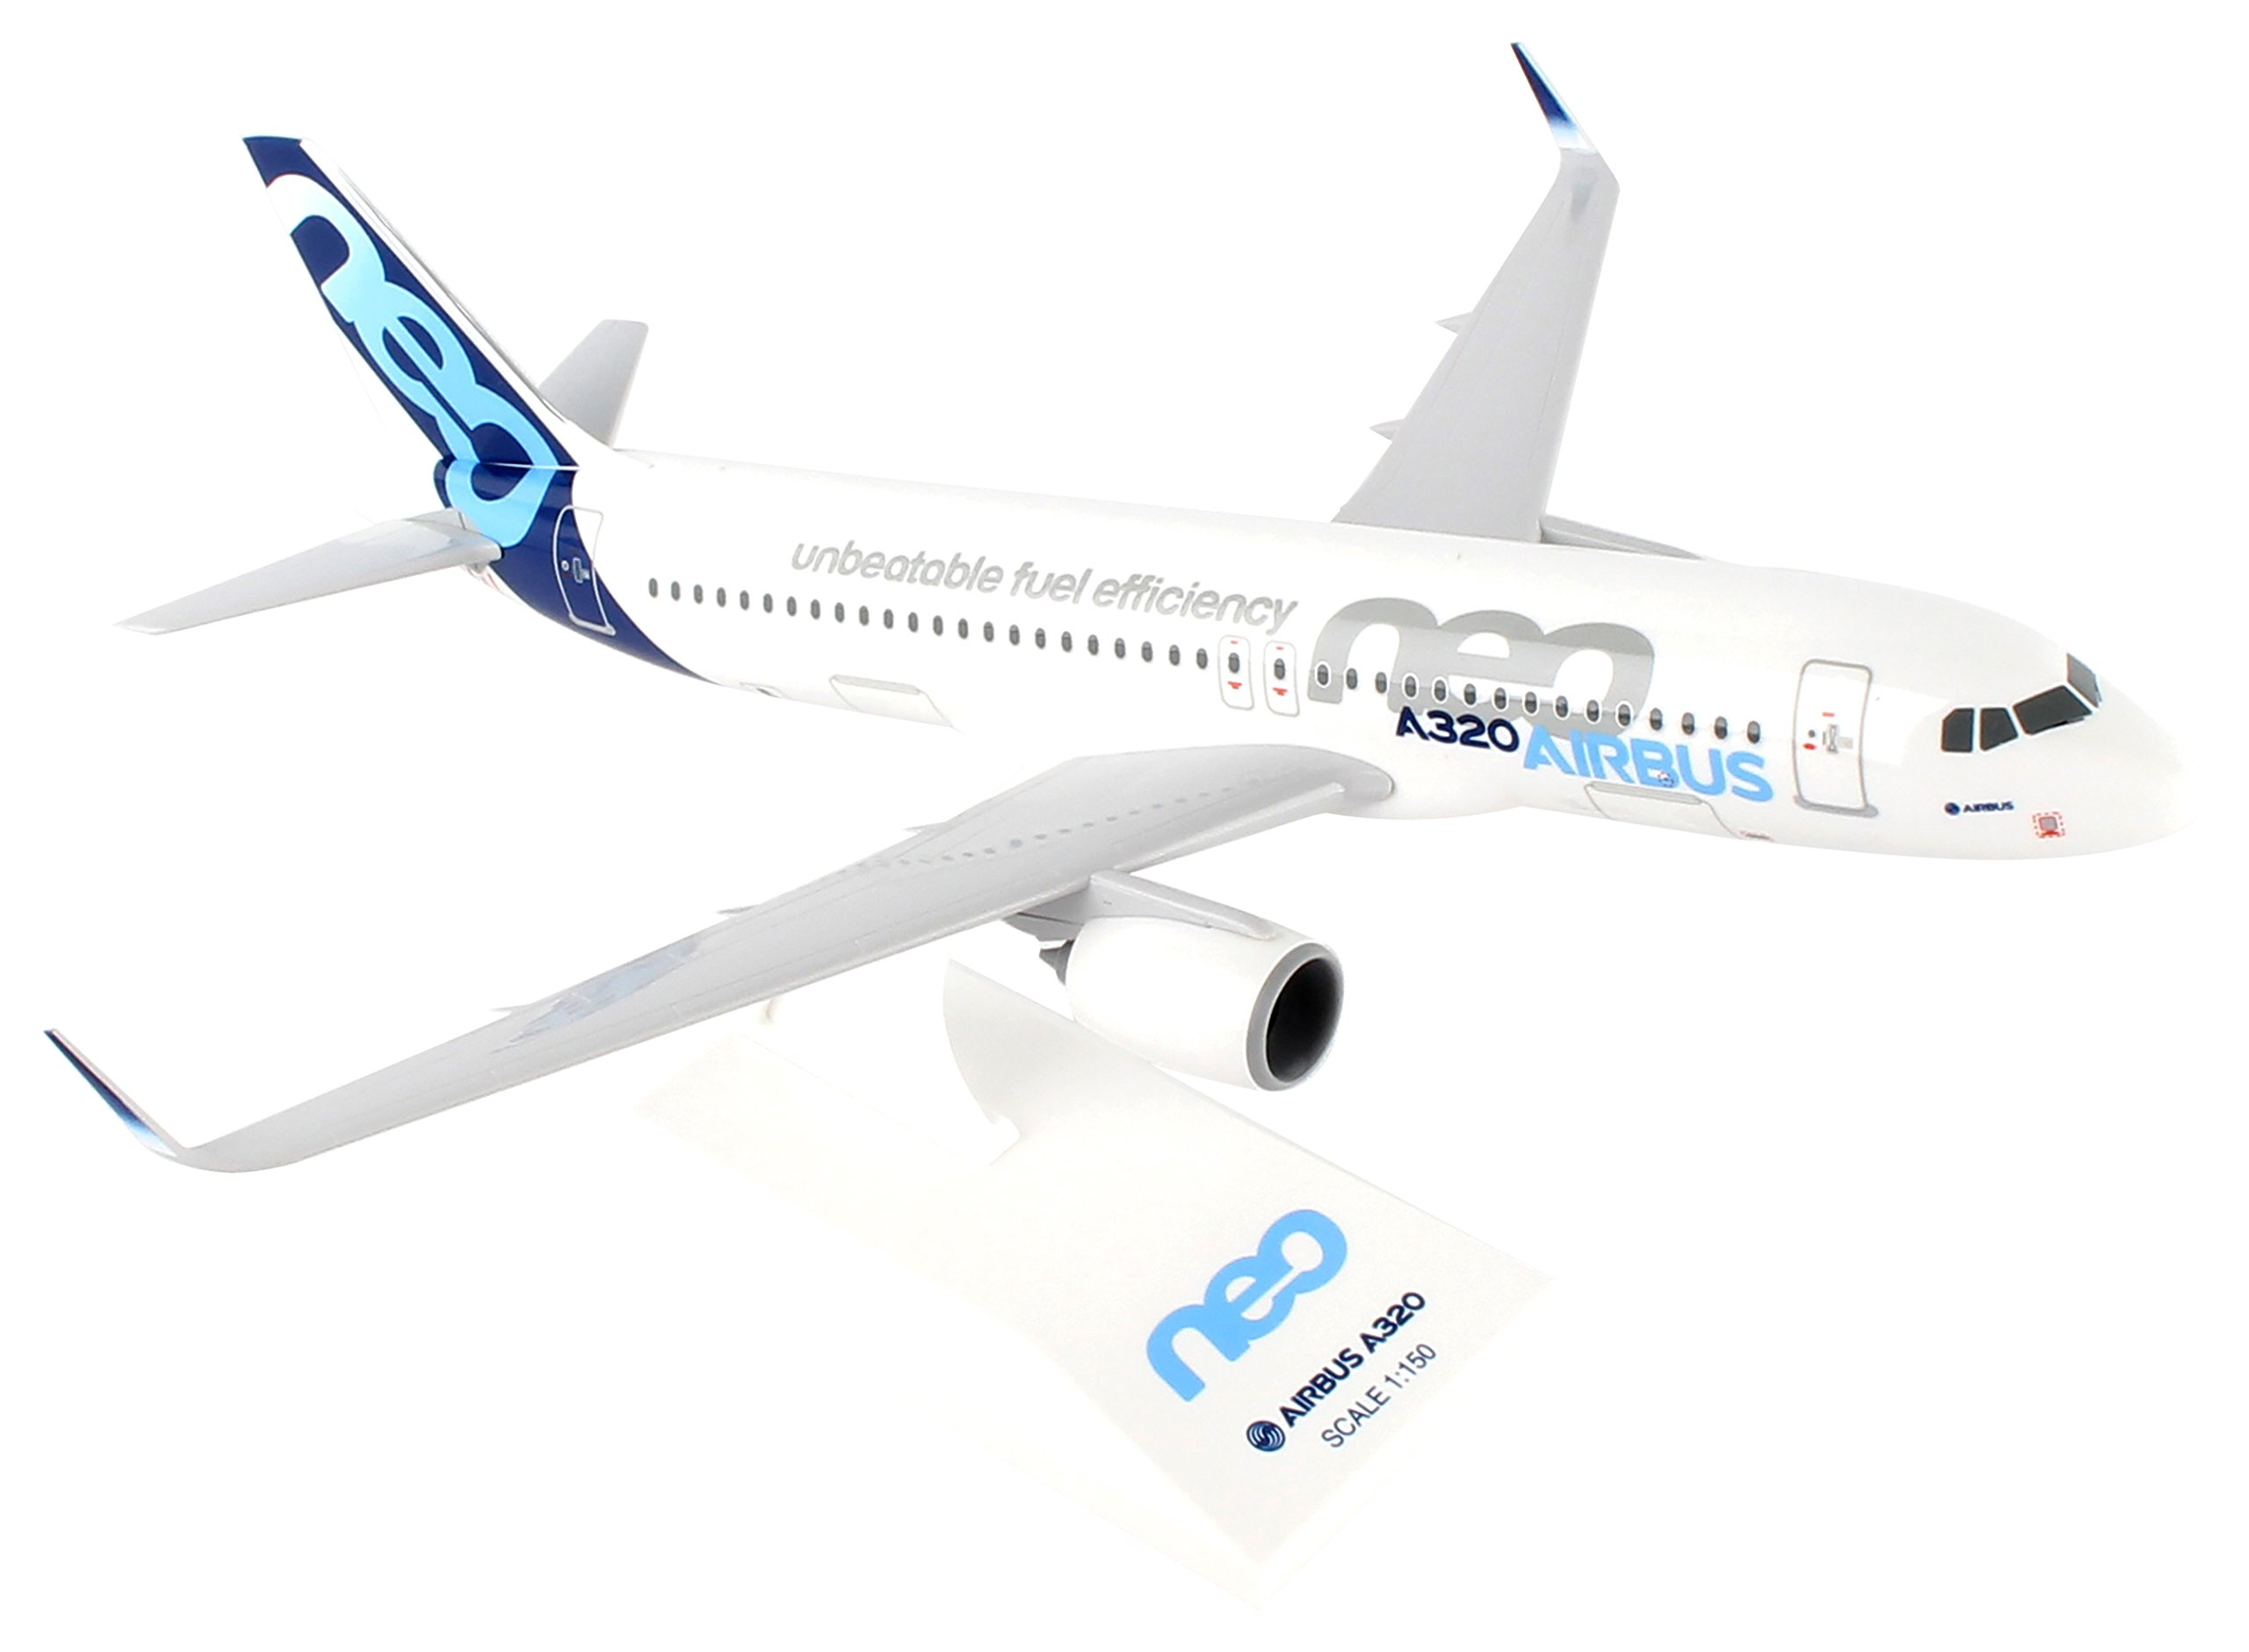 Daron Worldwide Trading Airplane Model Vehicle by Daron (Image #1)